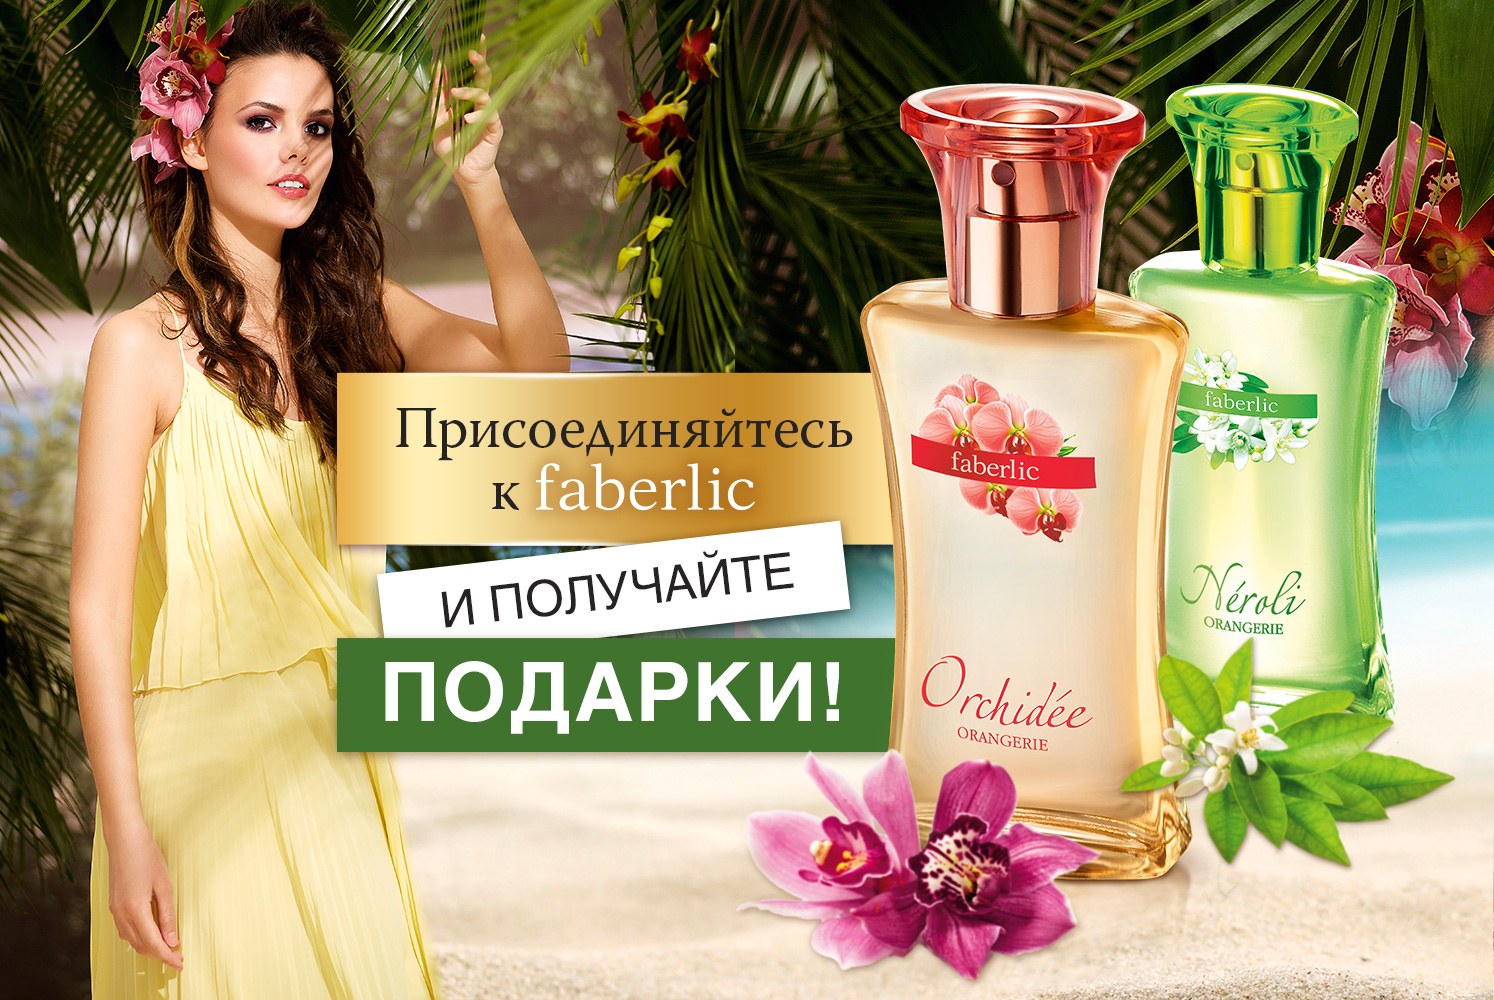 Косметика фаберлик каталог украина 2016